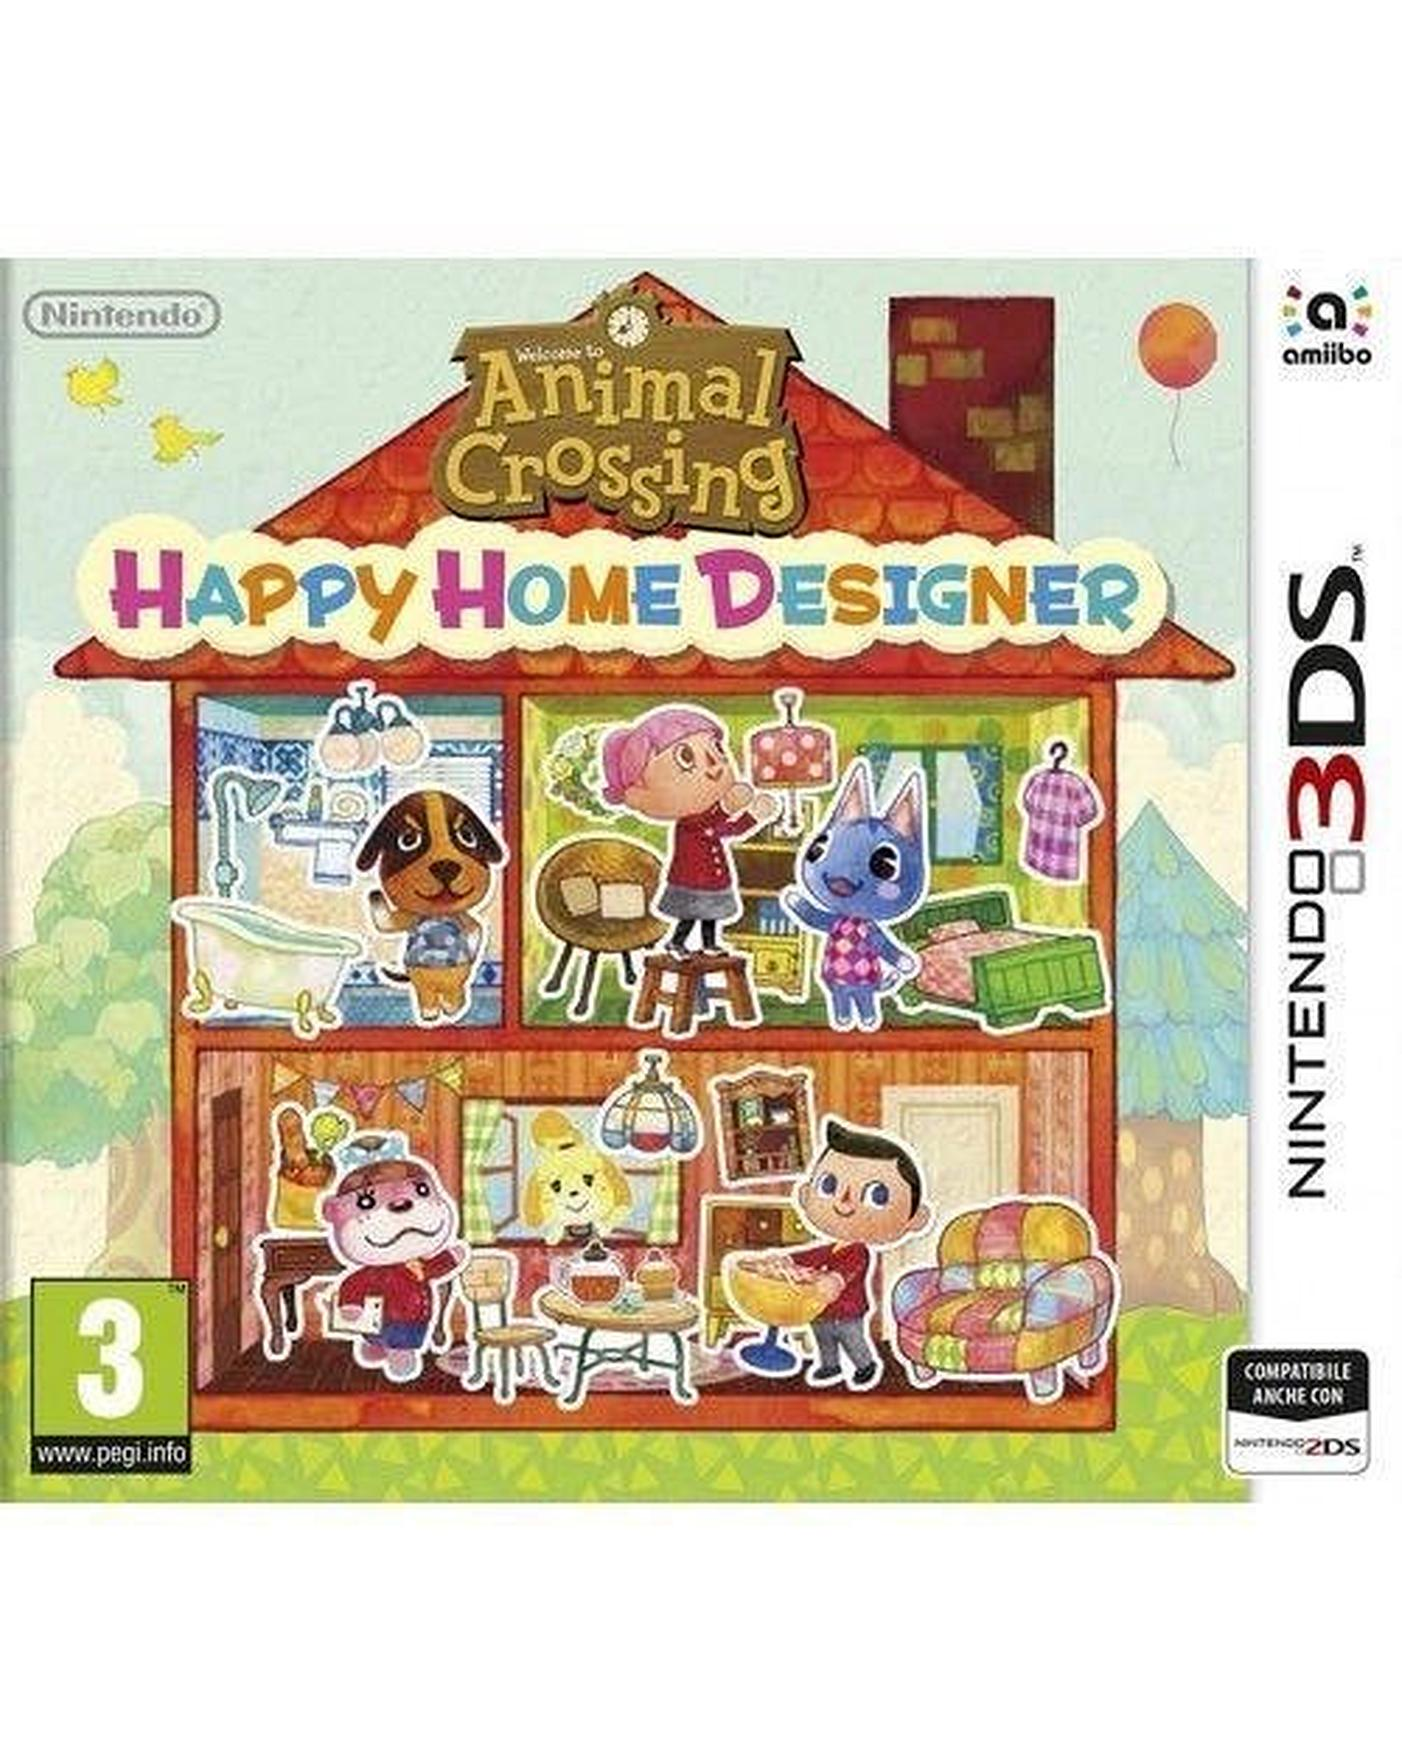 Animal Crossing Happy Home Designer S